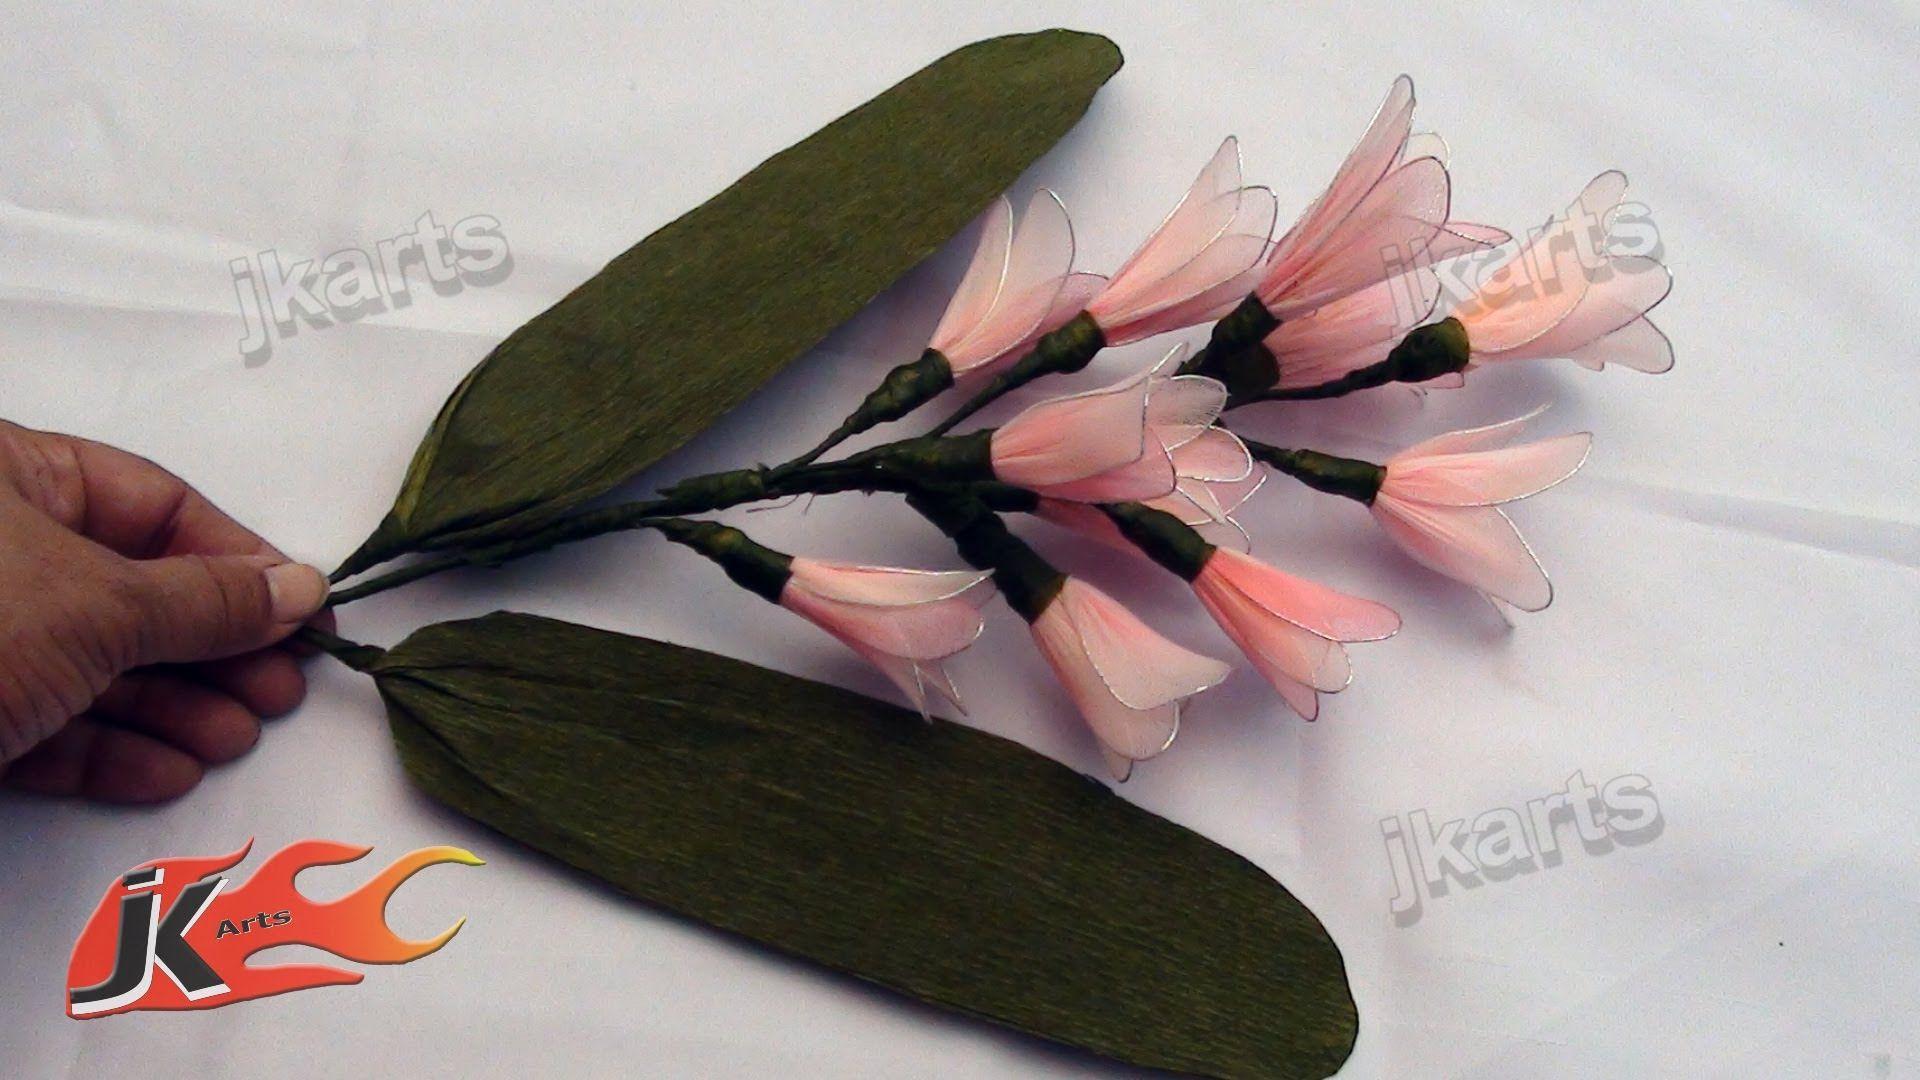 Diy Stocking Flower Bouquet Hyacinth Jk Arts 113 Nylon Blommor